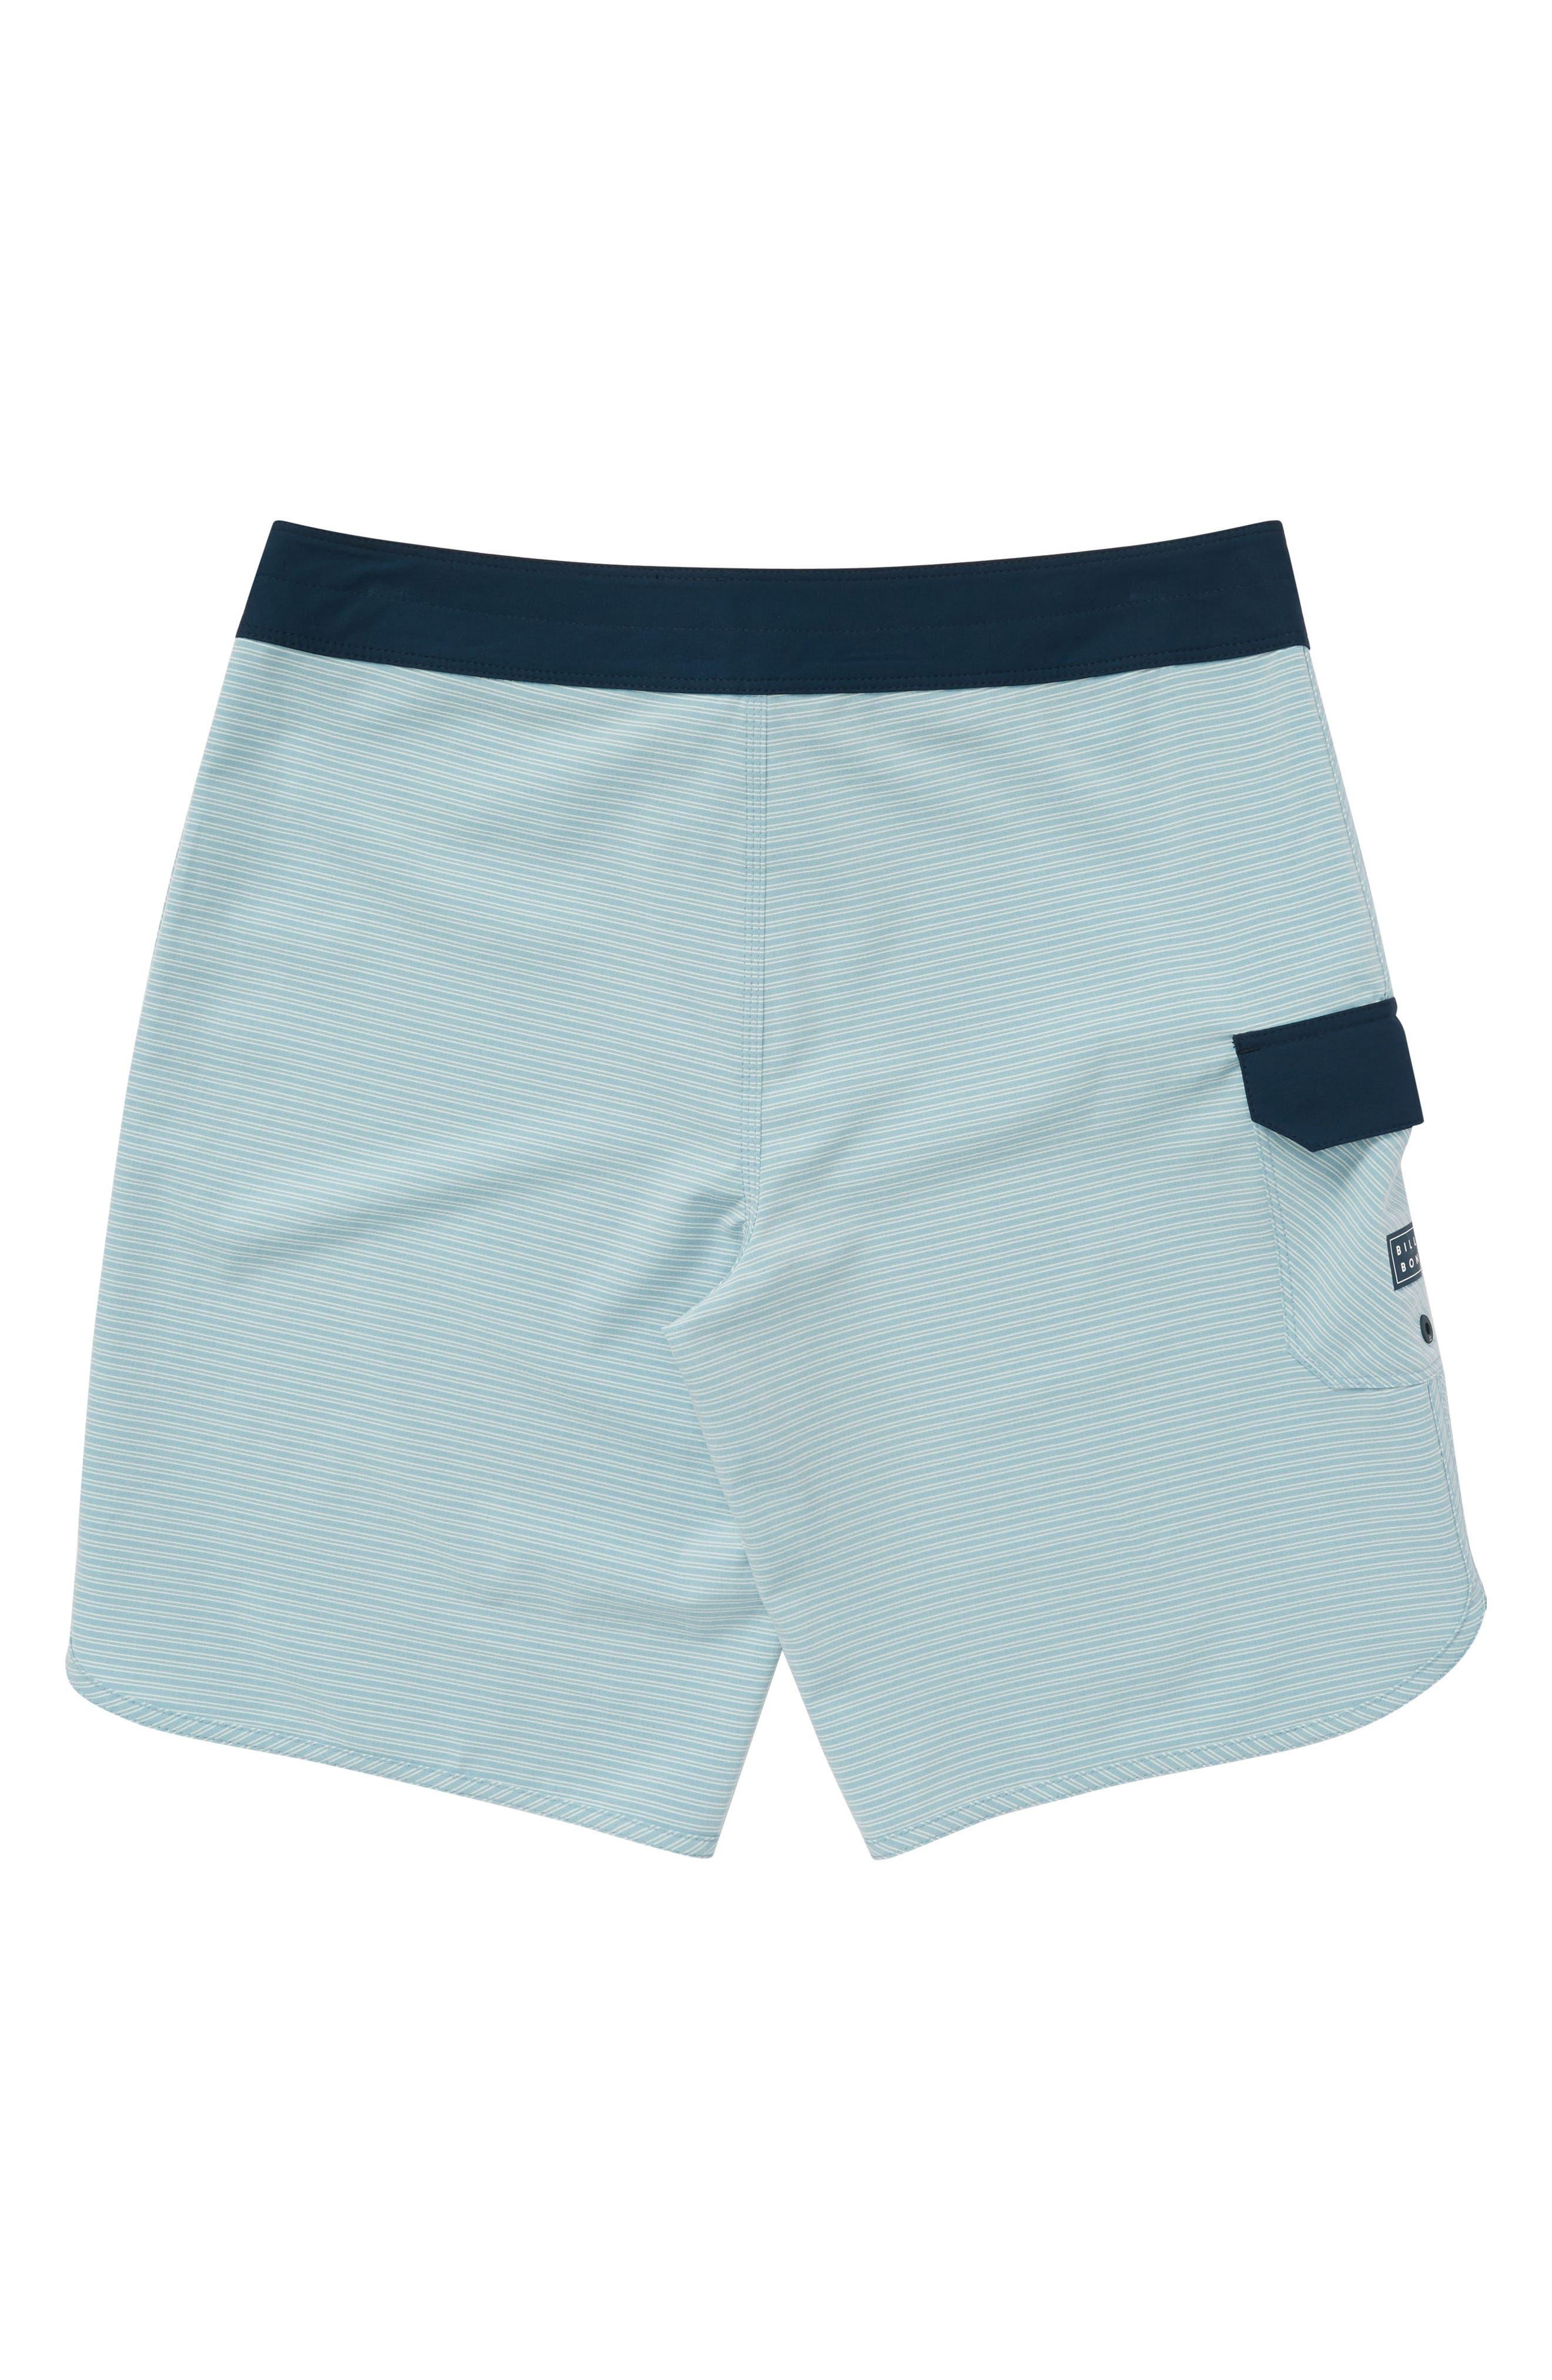 Alternate Image 2  - Billabong 73 X Board Shorts (Little Boys)